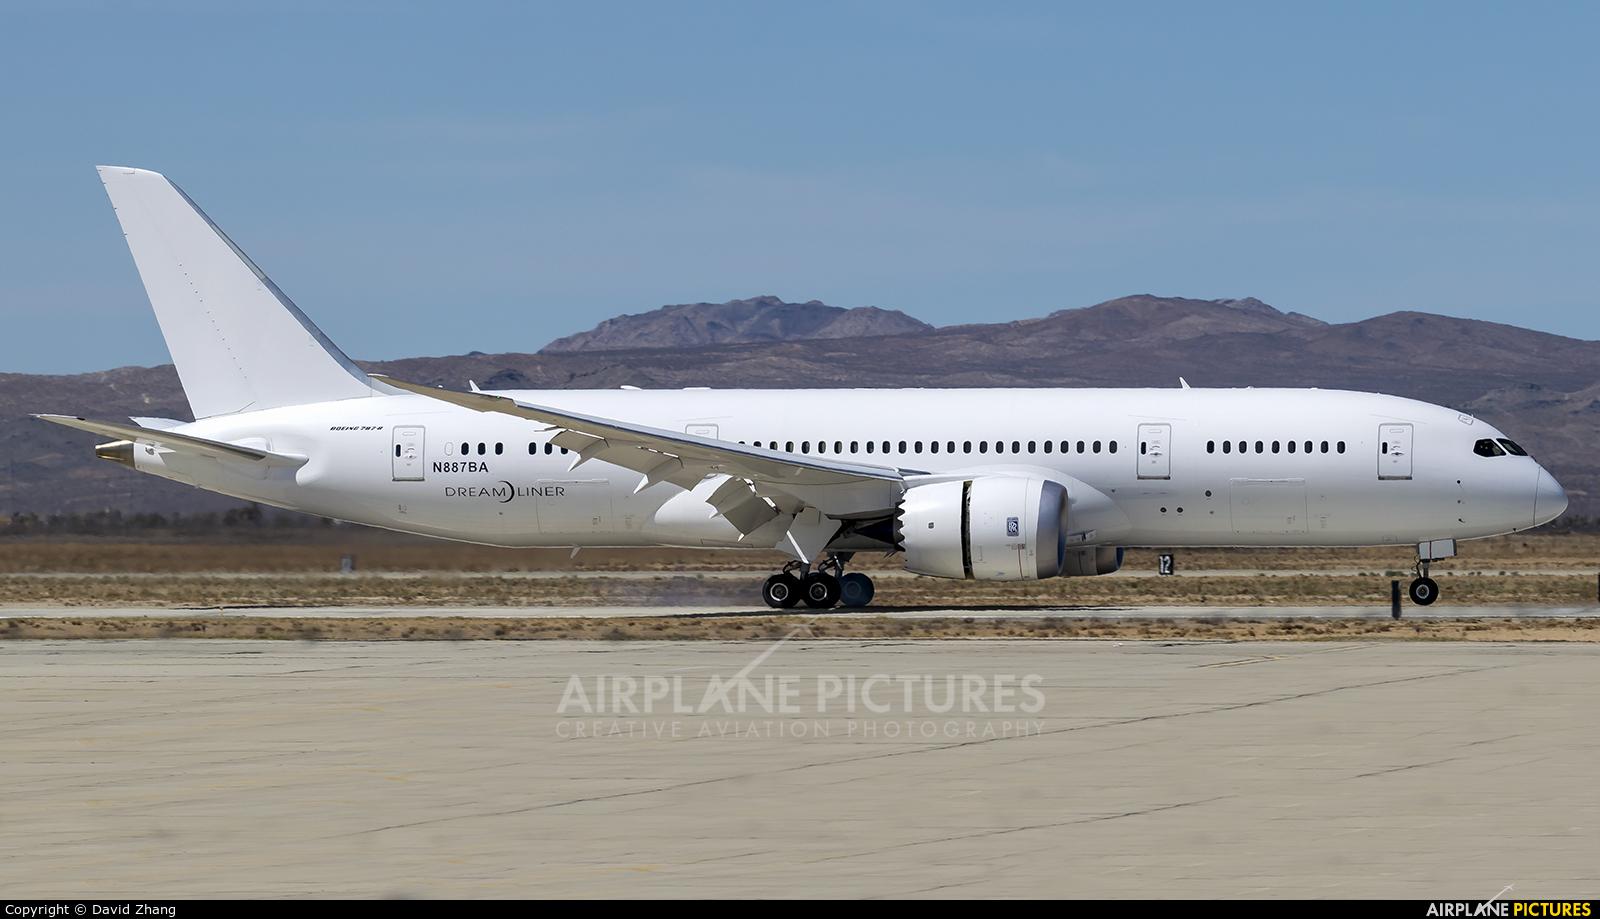 PrivatAir N887BA aircraft at Victorville - Southern California Logistics